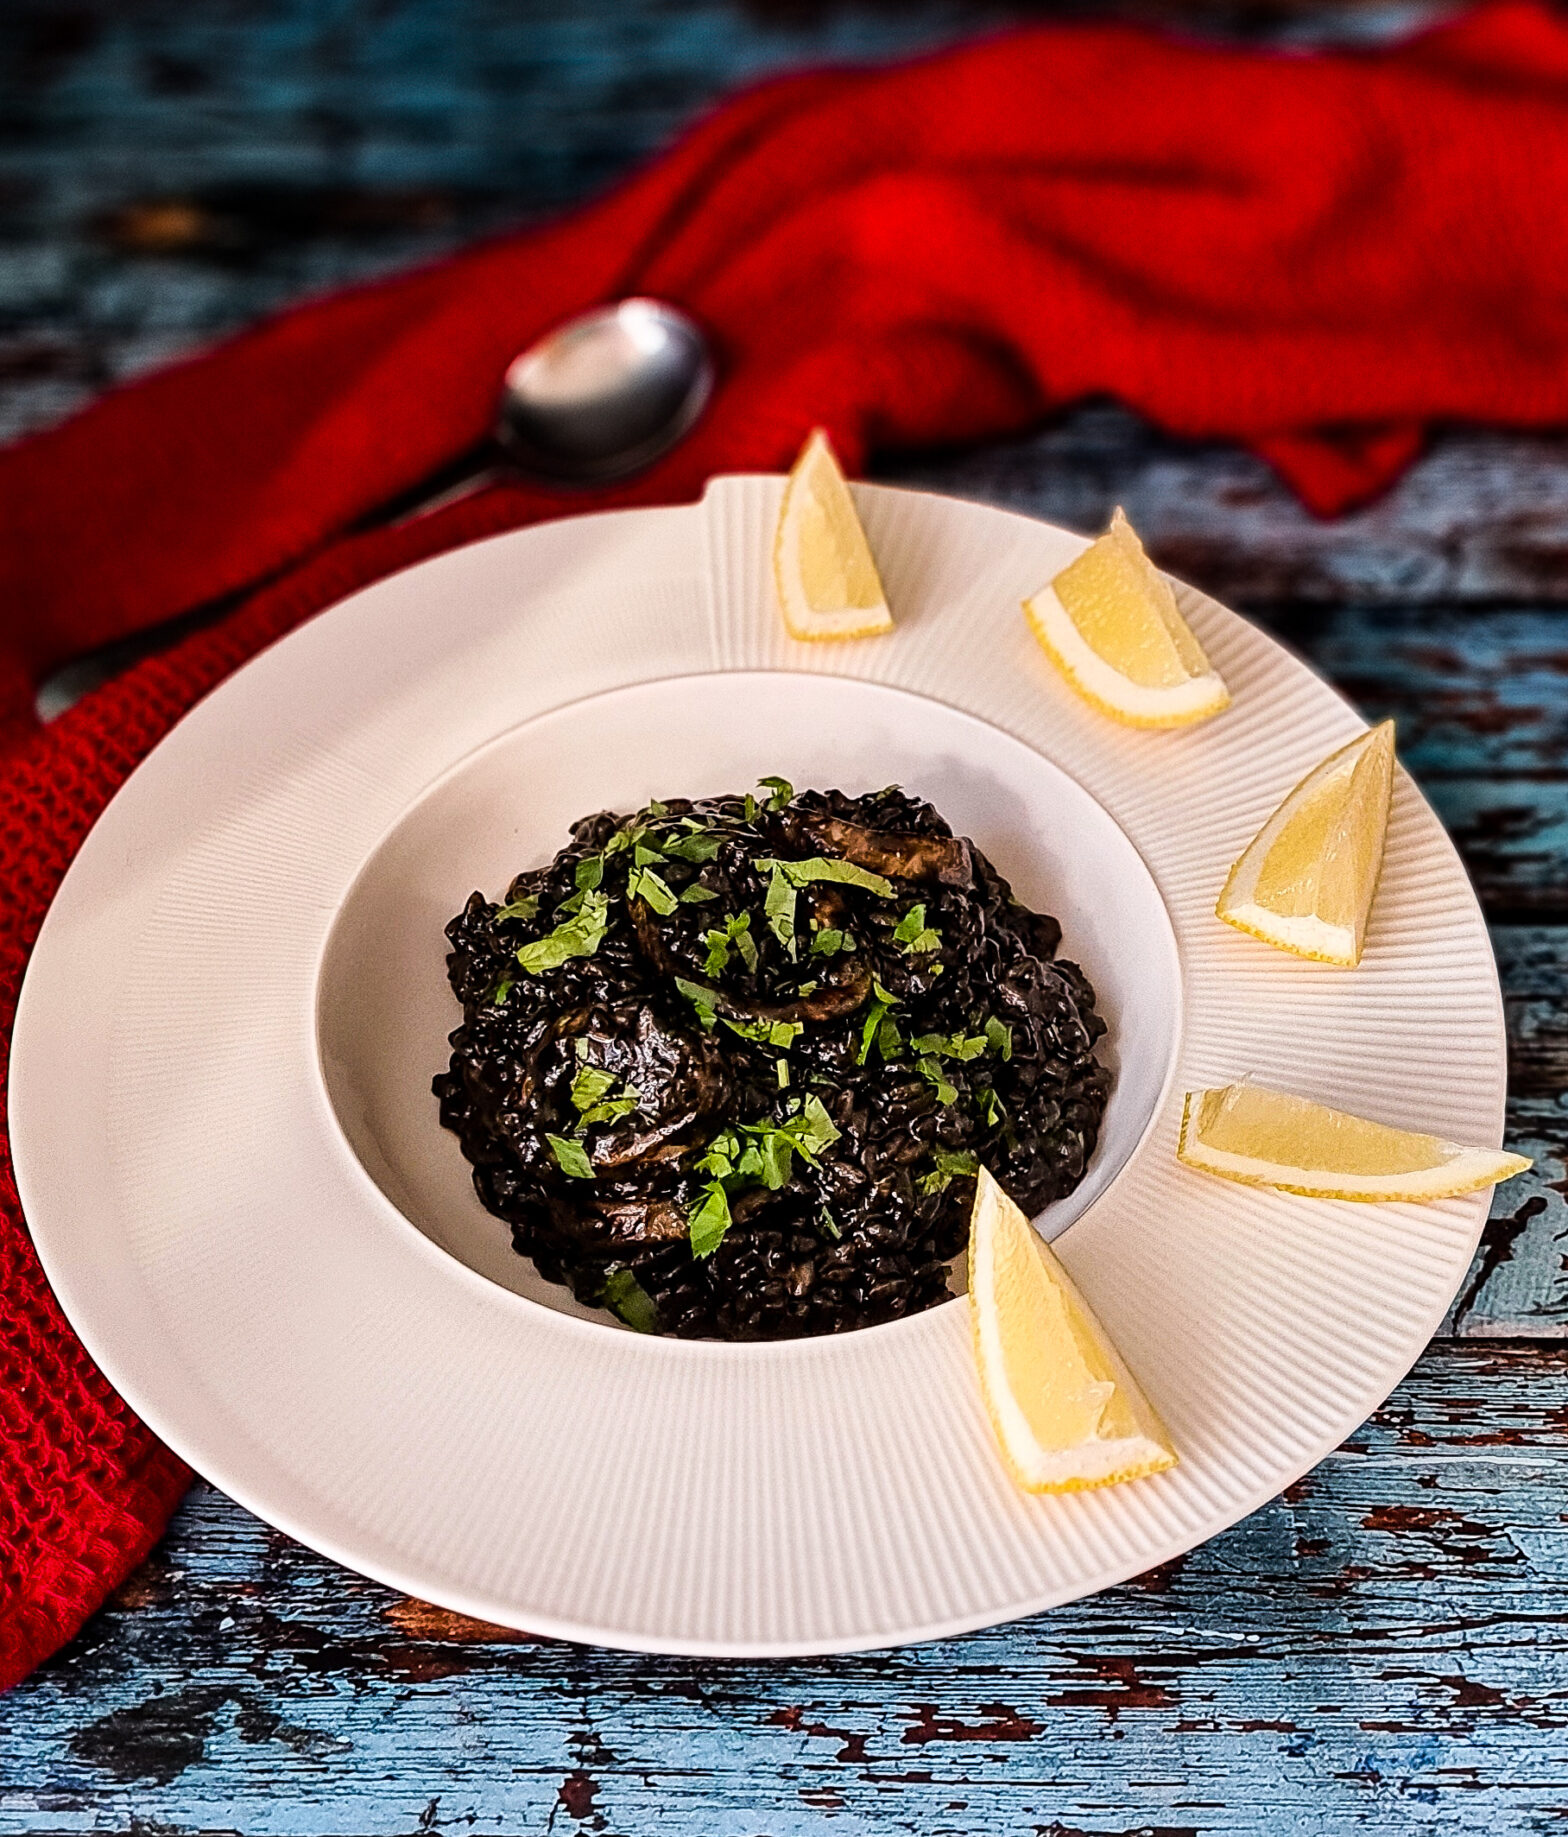 Crni Rižot czyli czarne risotto